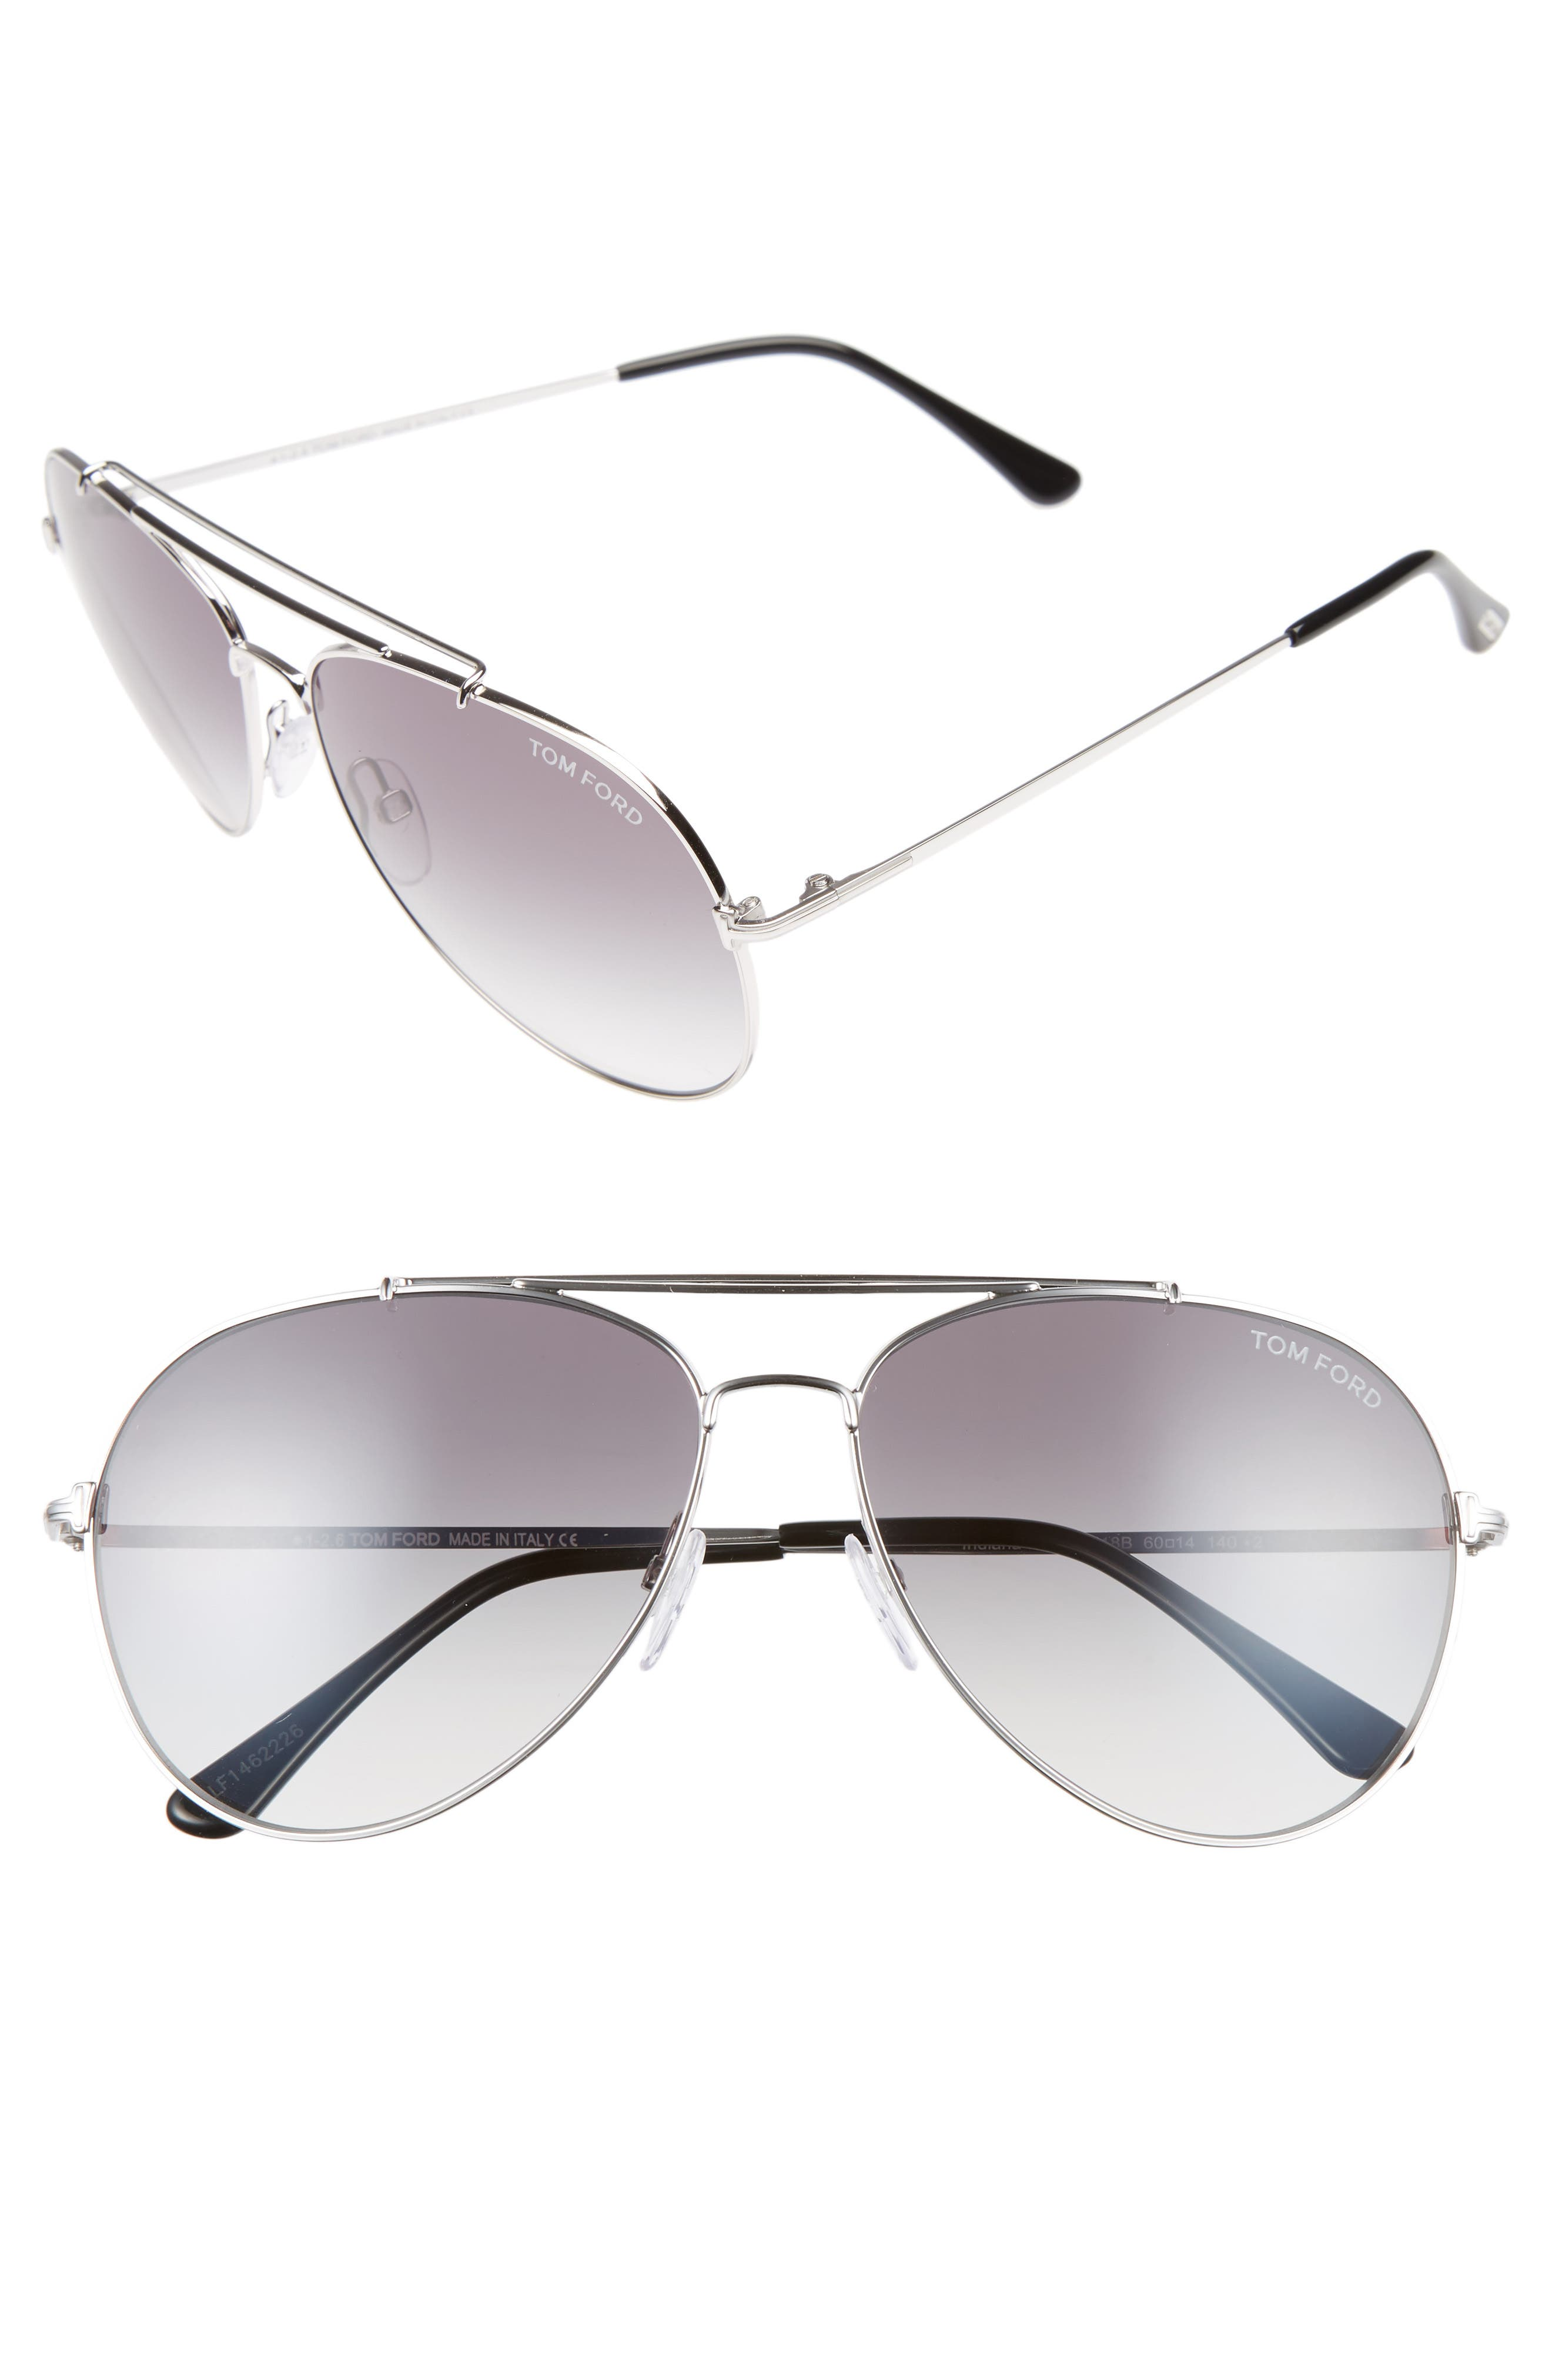 Indiana 60mm Aviator Sunglasses,                             Main thumbnail 1, color,                             Rhodium/ Black/ Gradient Smoke